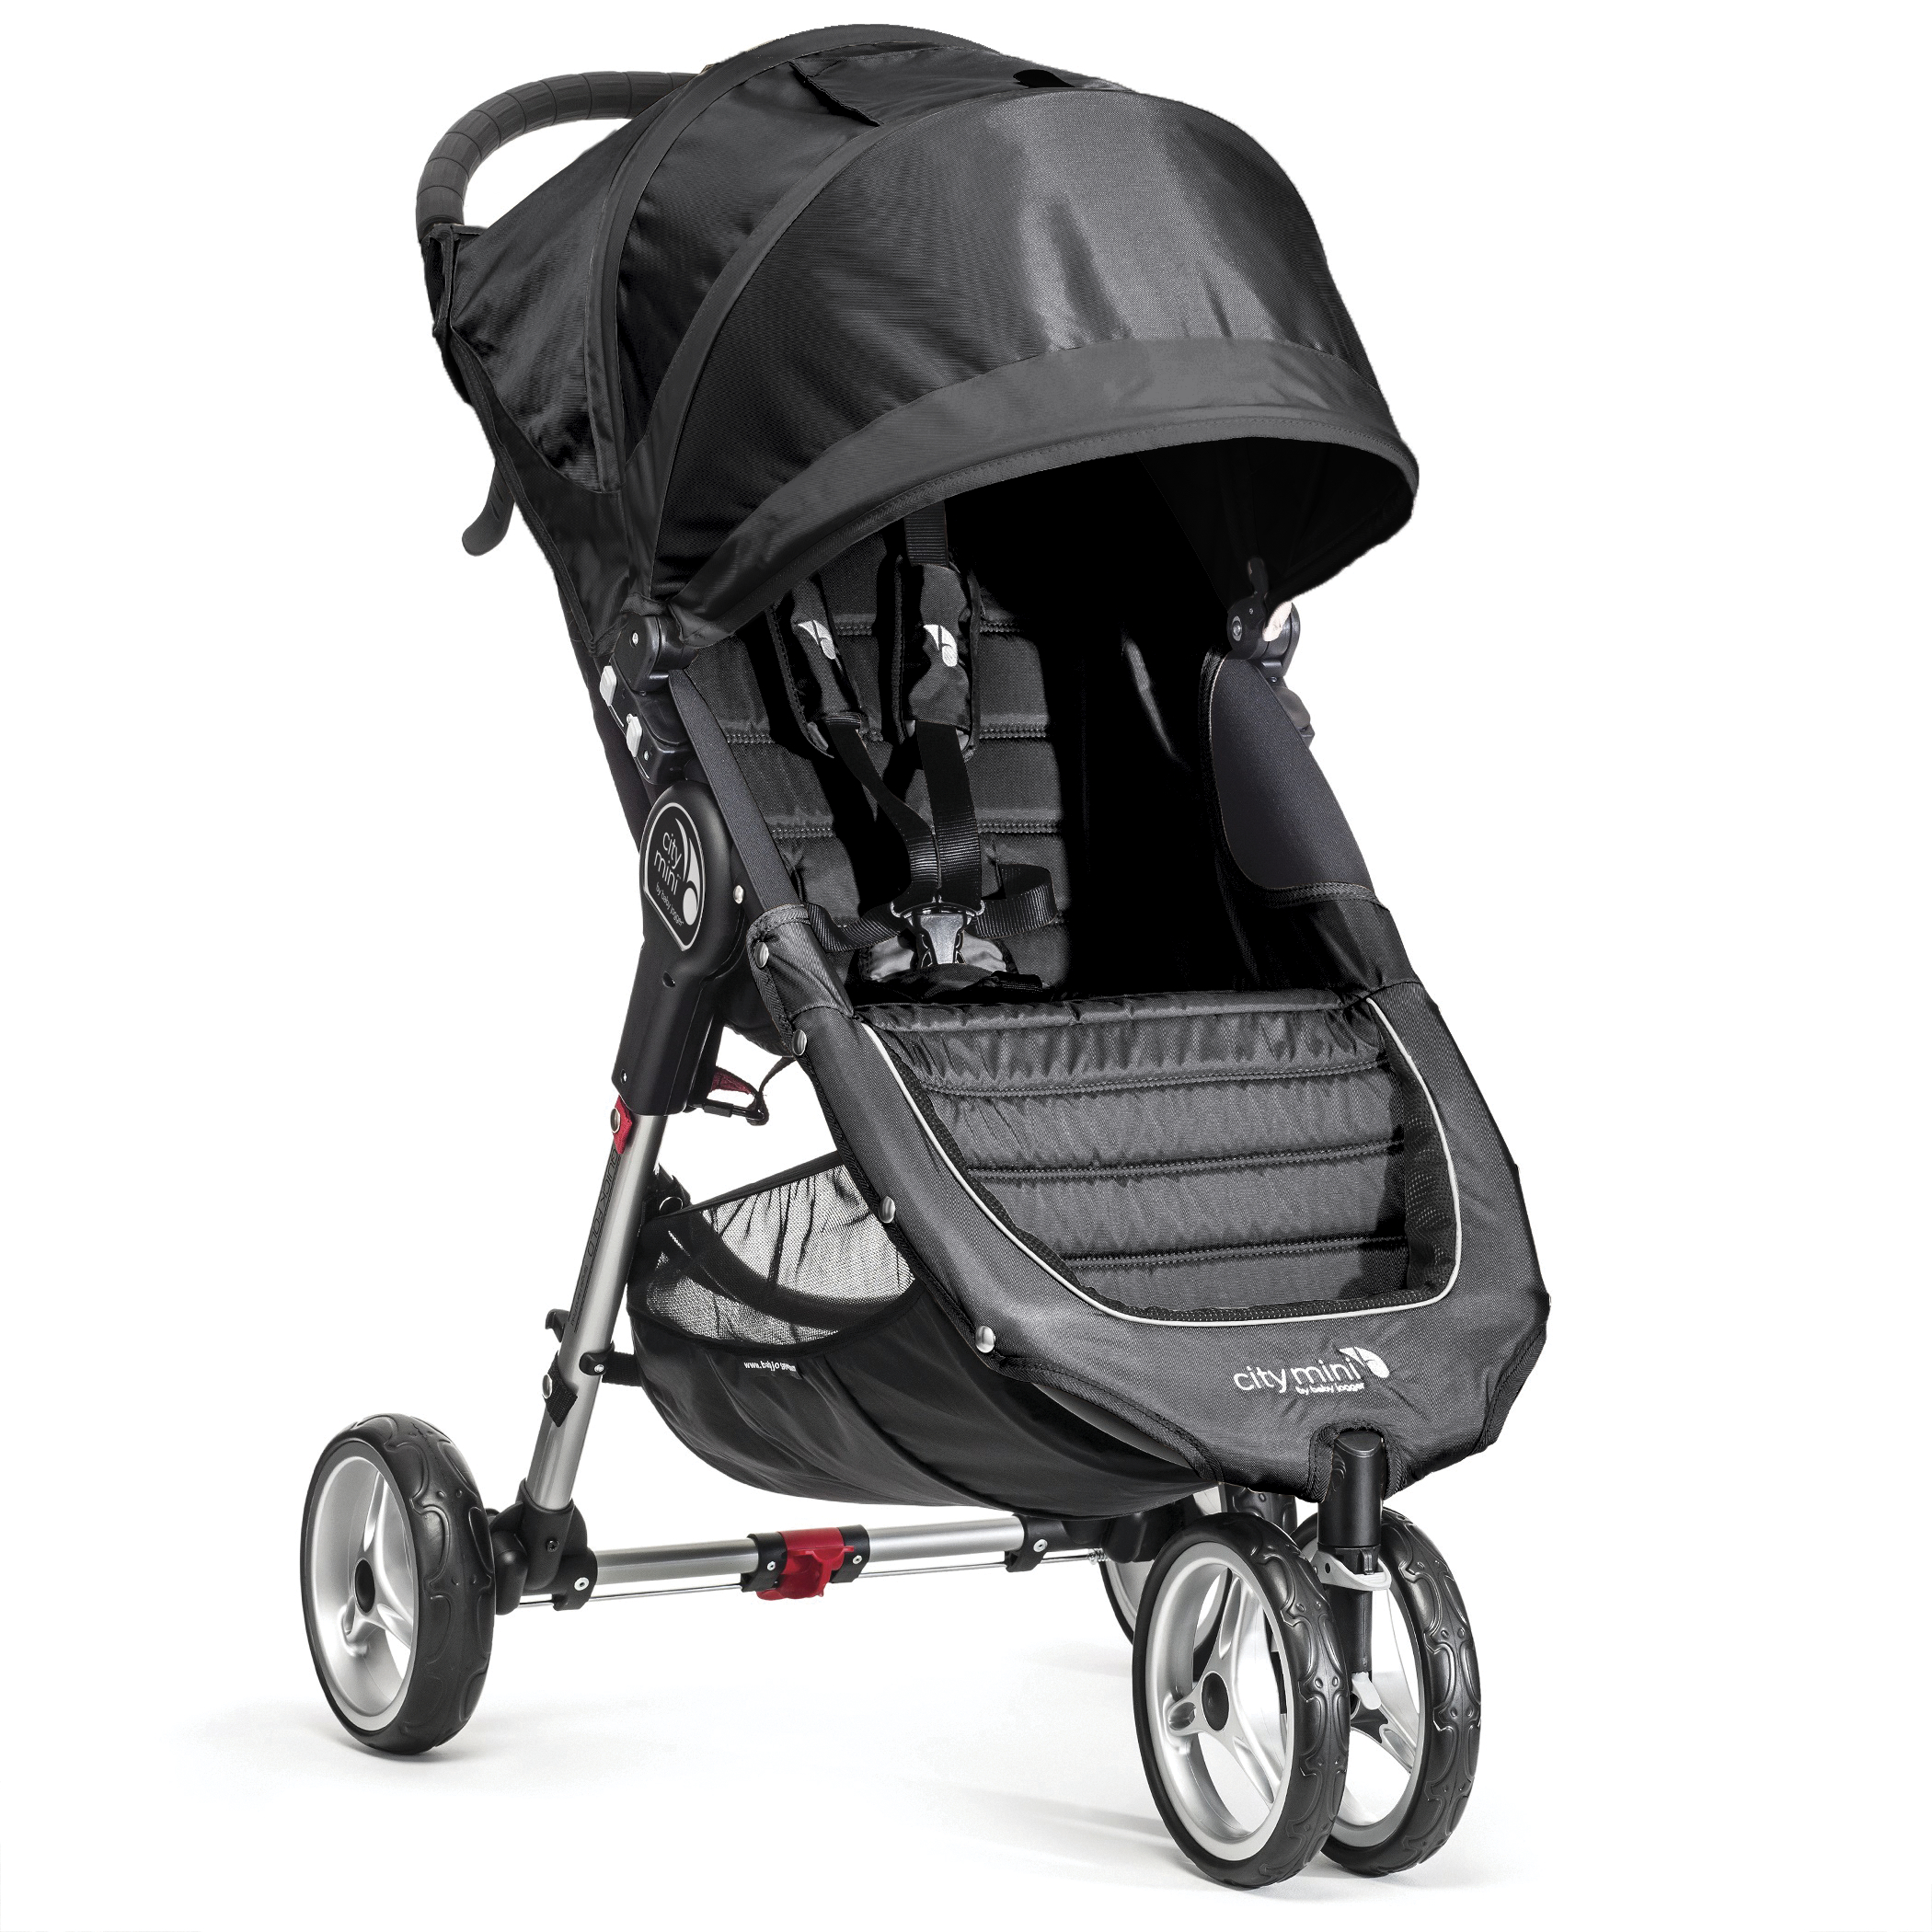 Baby jogger Baby jogger city mini - charcoal/denim, 5 stk. på lager fra pixizoo